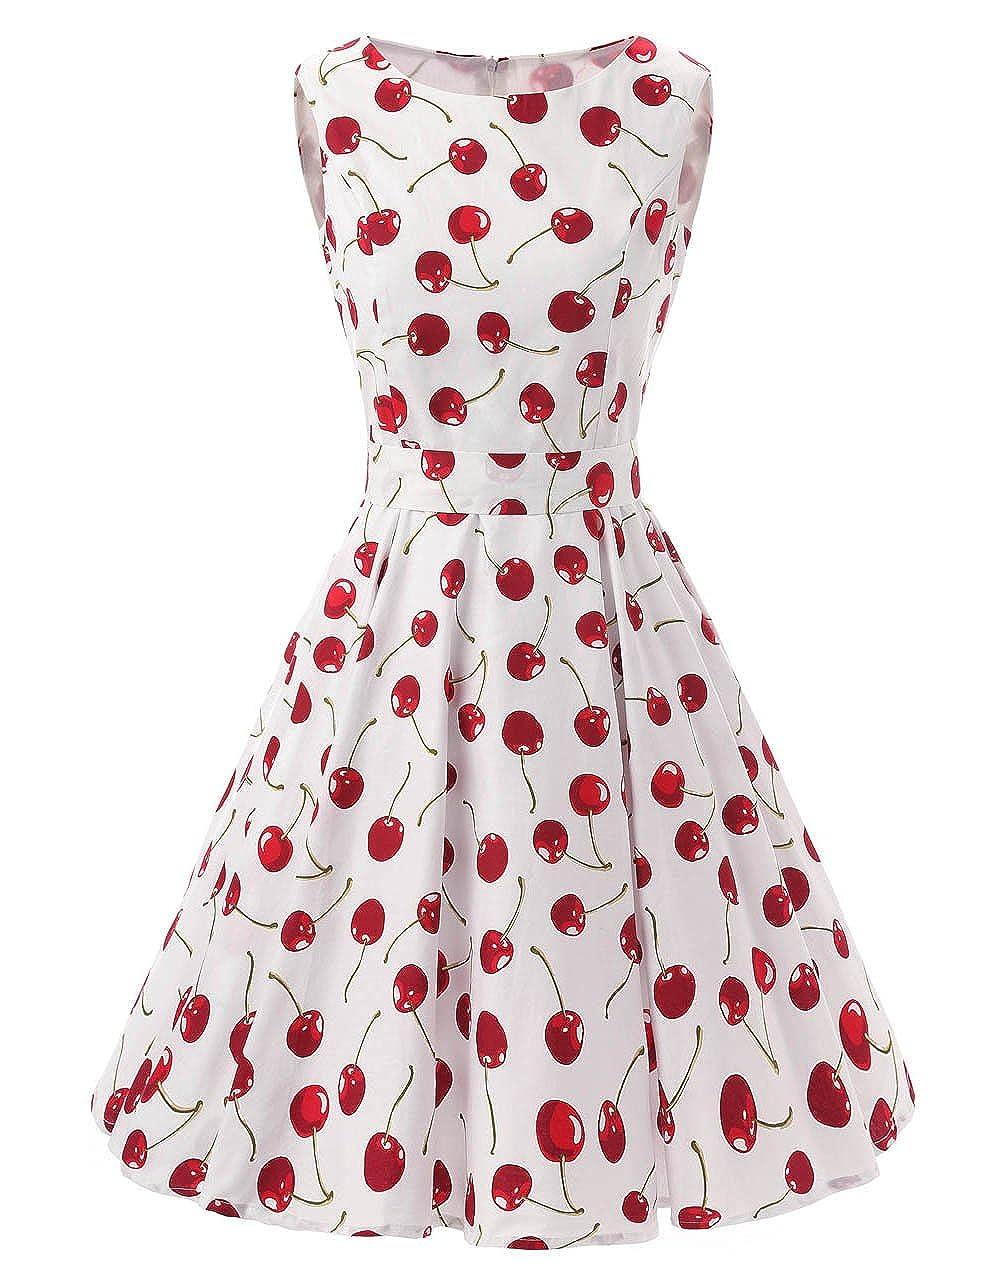 Cherry Ensnovo Womens Vintage 1950s Sleeveless Retro Floral Print Rockabilly Swing Dress